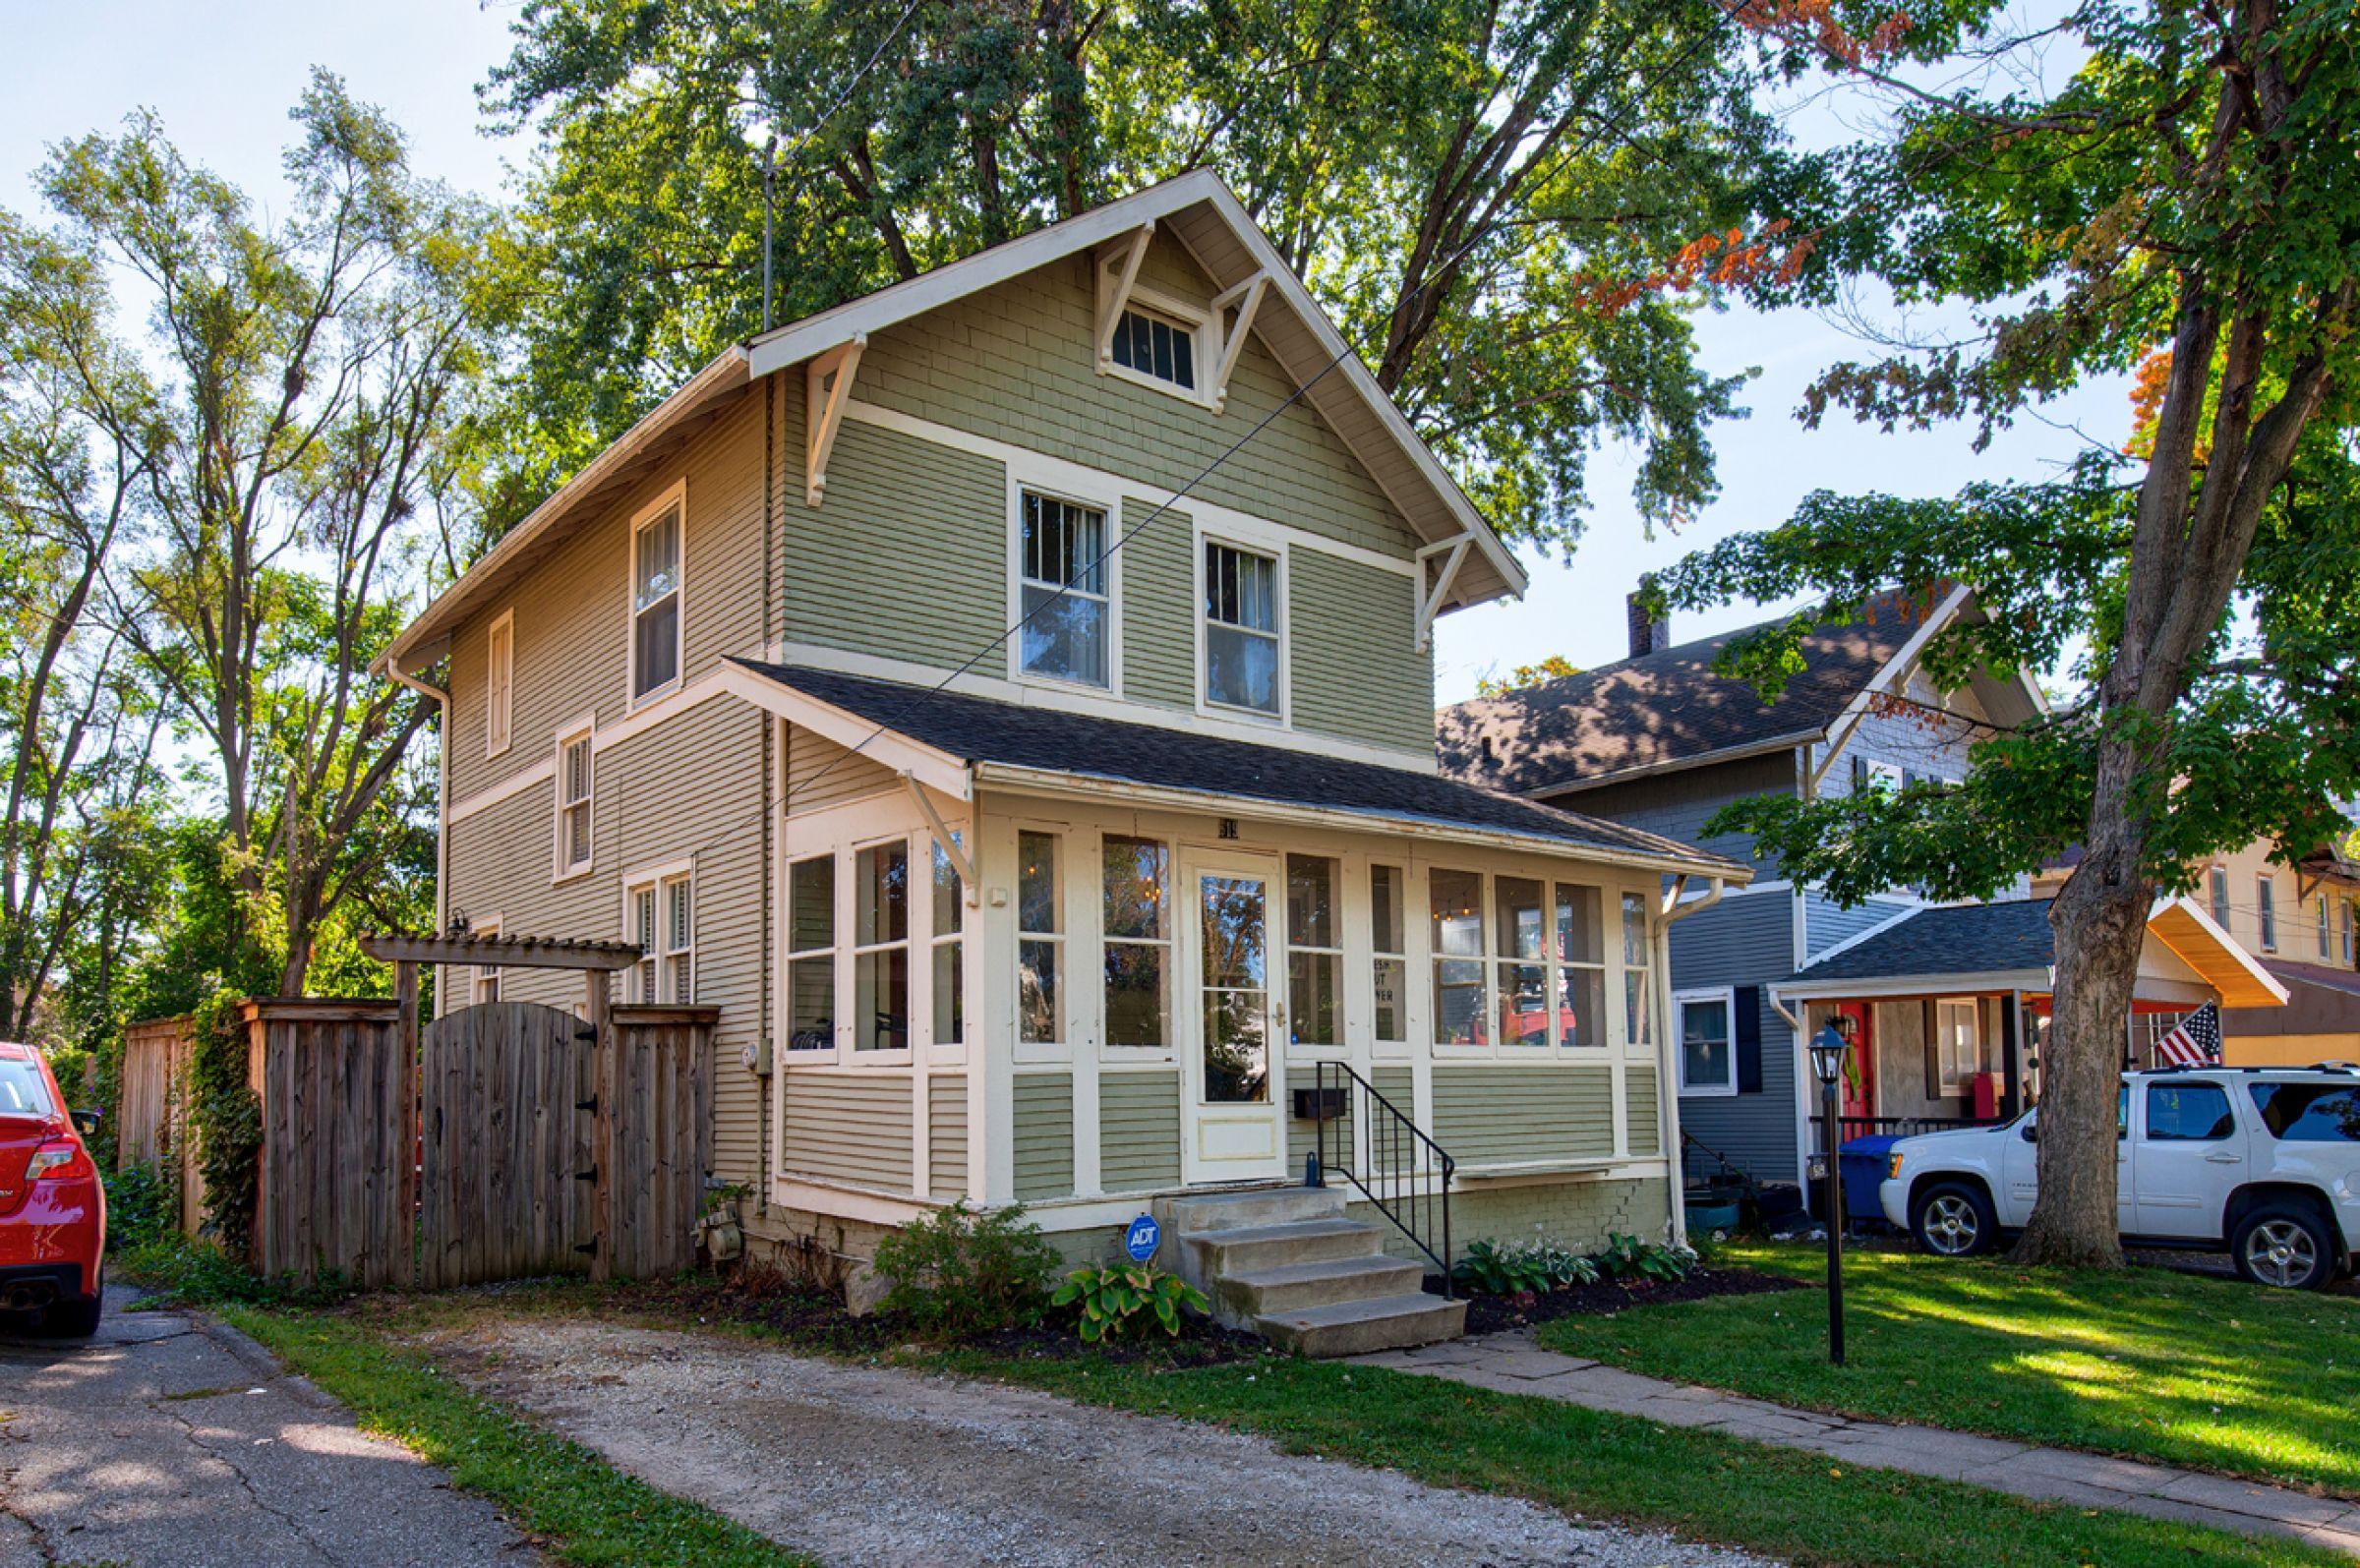 residential-polk-county-iowa-0-acres-listing-number-15153-5-2020-09-02-231951.jpg